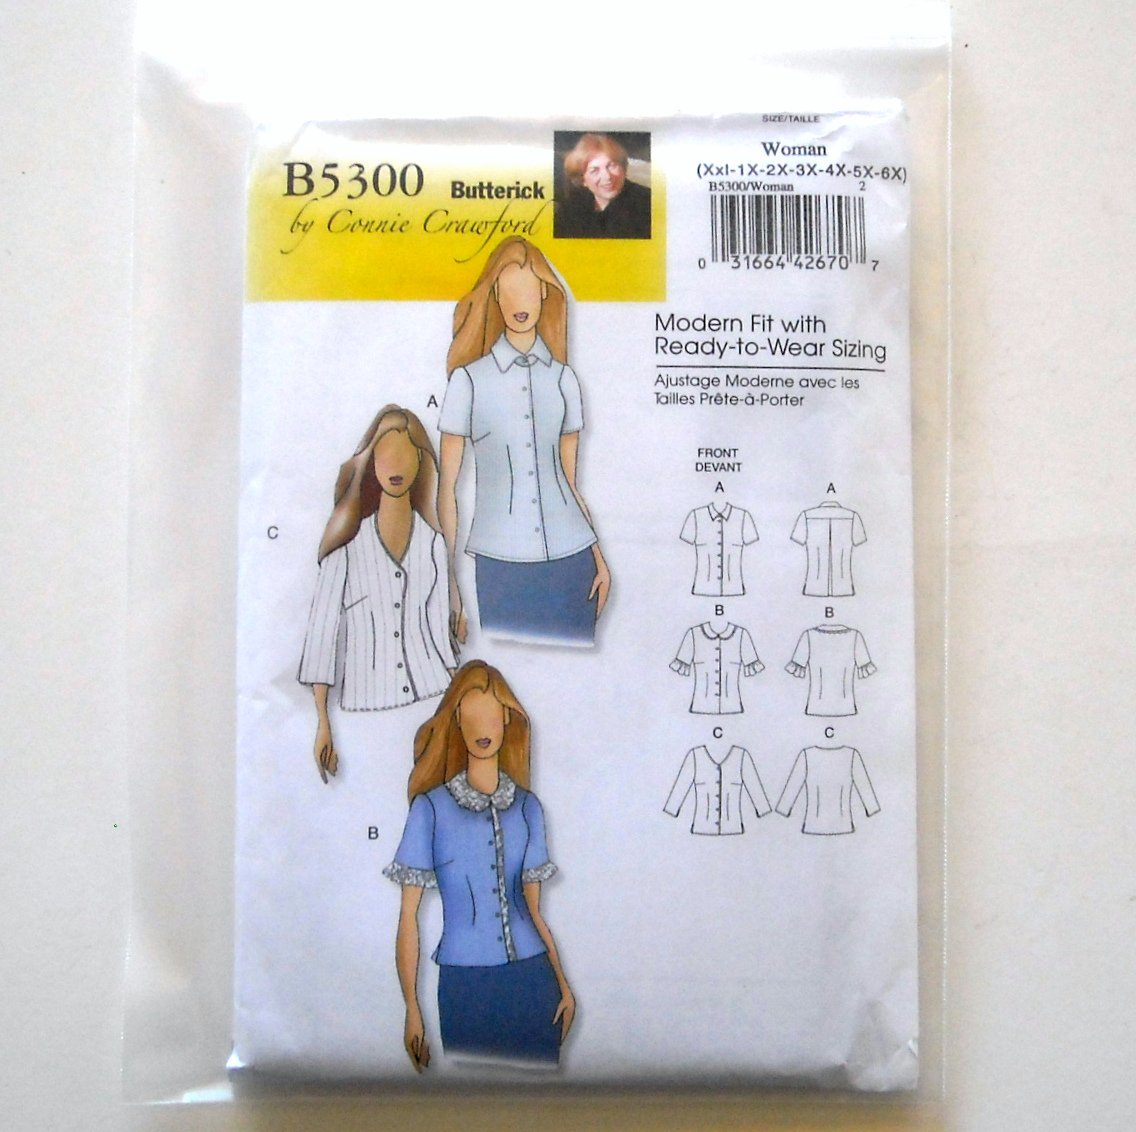 Women's Blouse Size XXL - 6X Connie Crawford Butterick Pattern B5300